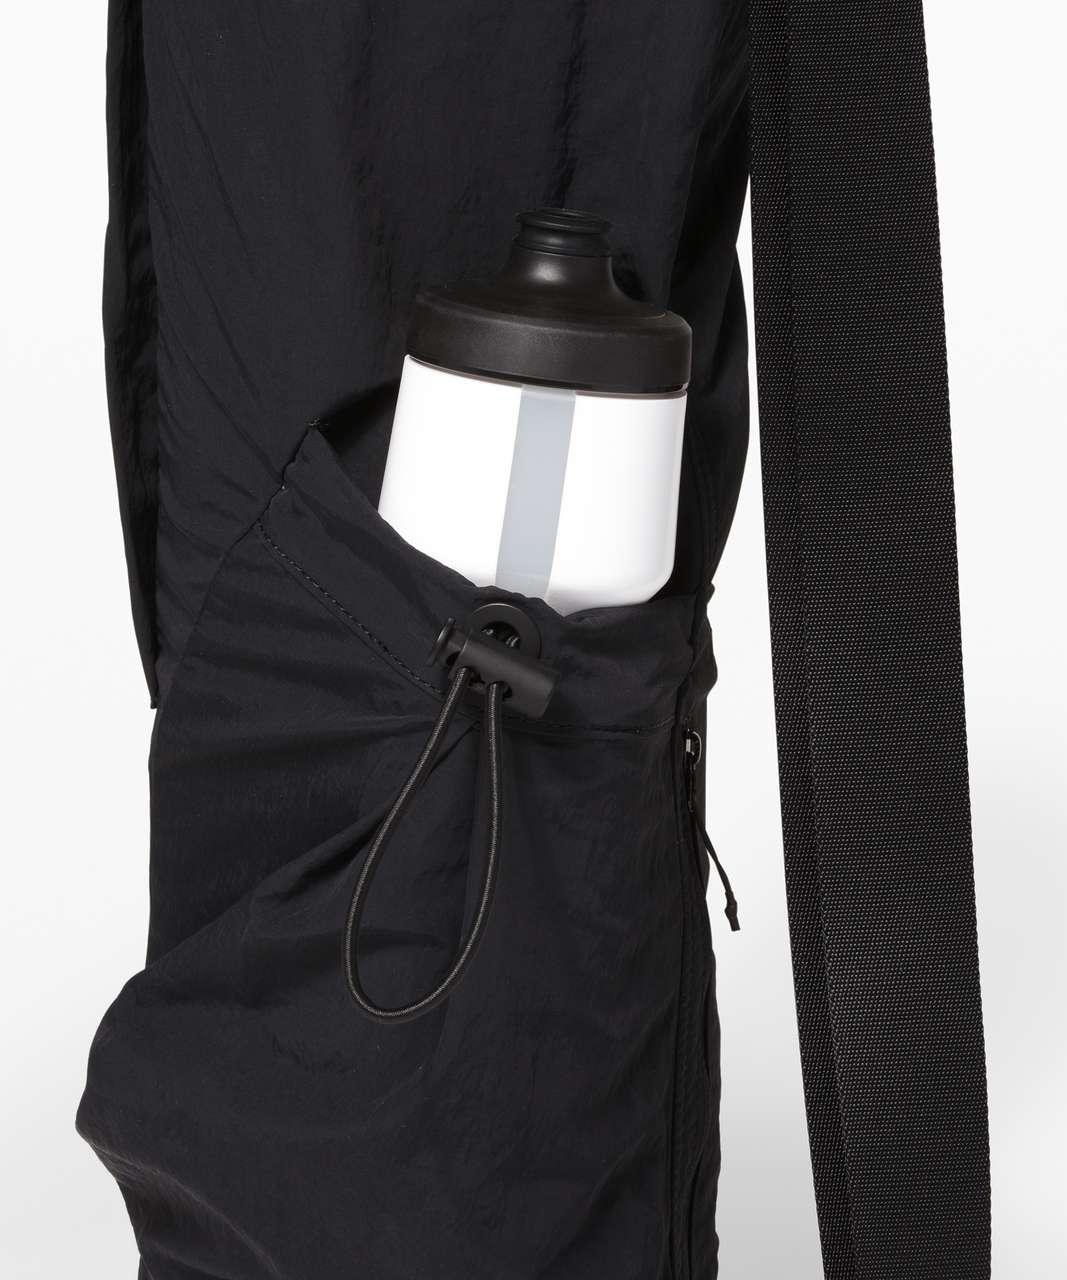 Lululemon The Yoga Mat Bag *16L - Black